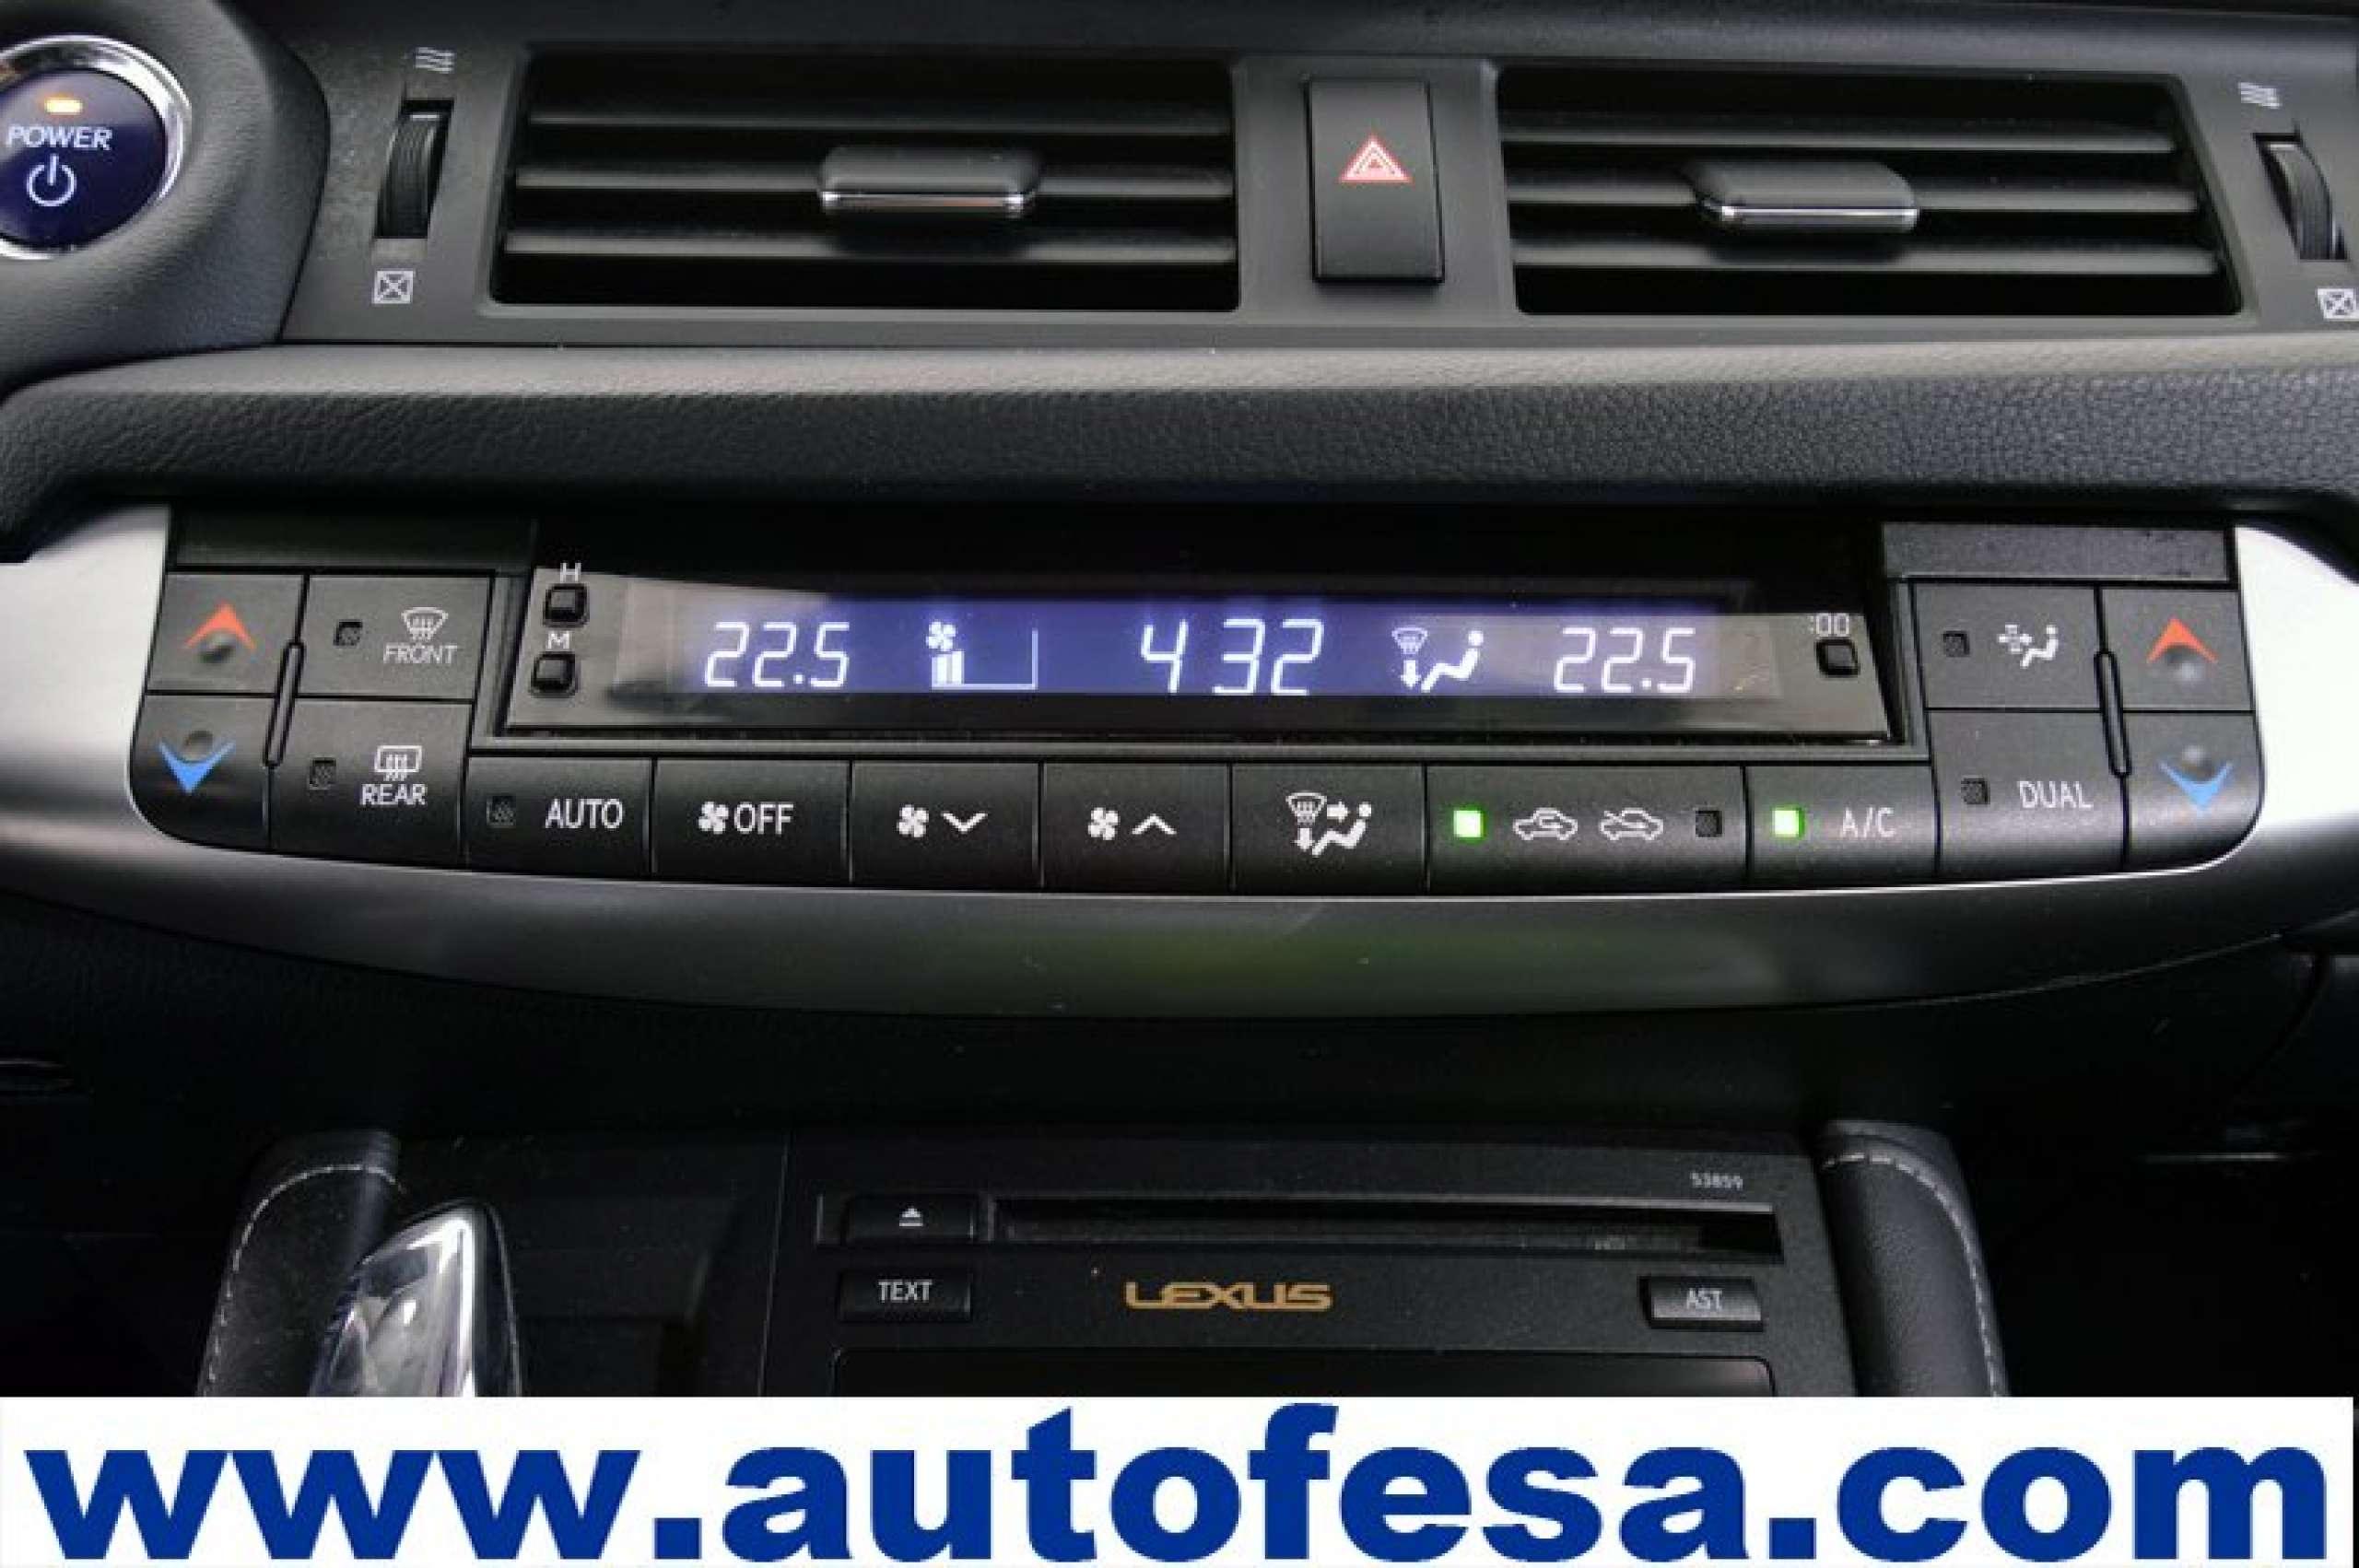 Lexus Ct 200h 1.8 136cv Eco Auto 5p - Foto 26